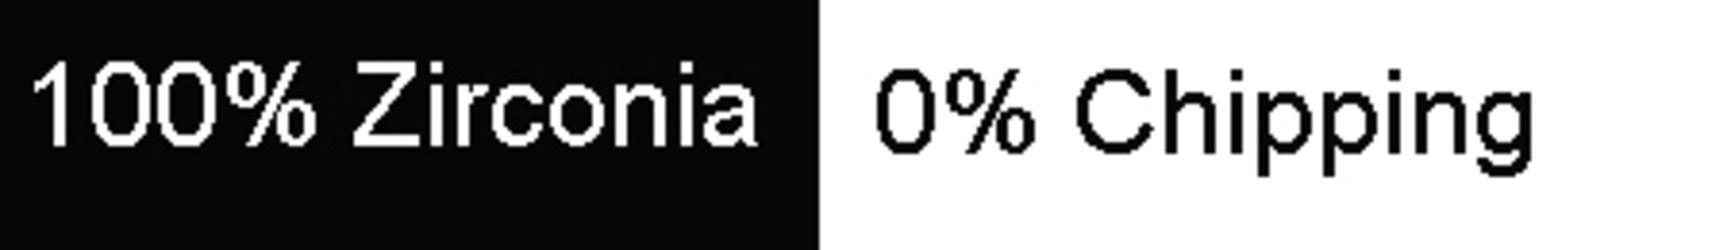 100% Zirconia 0% Chipping Banner